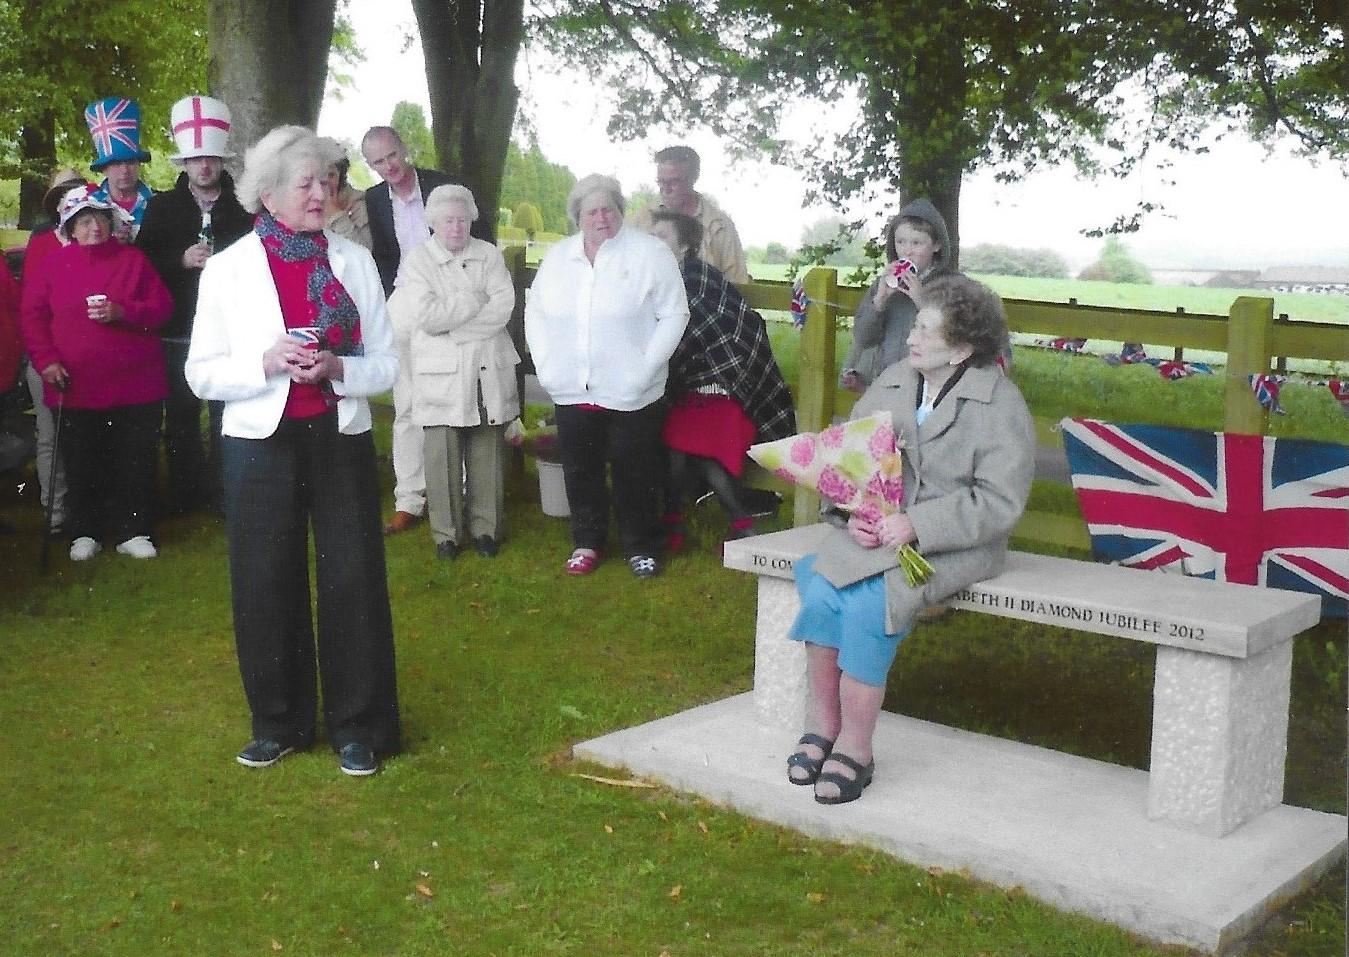 Inauguration of Jubilee Seat June 2012